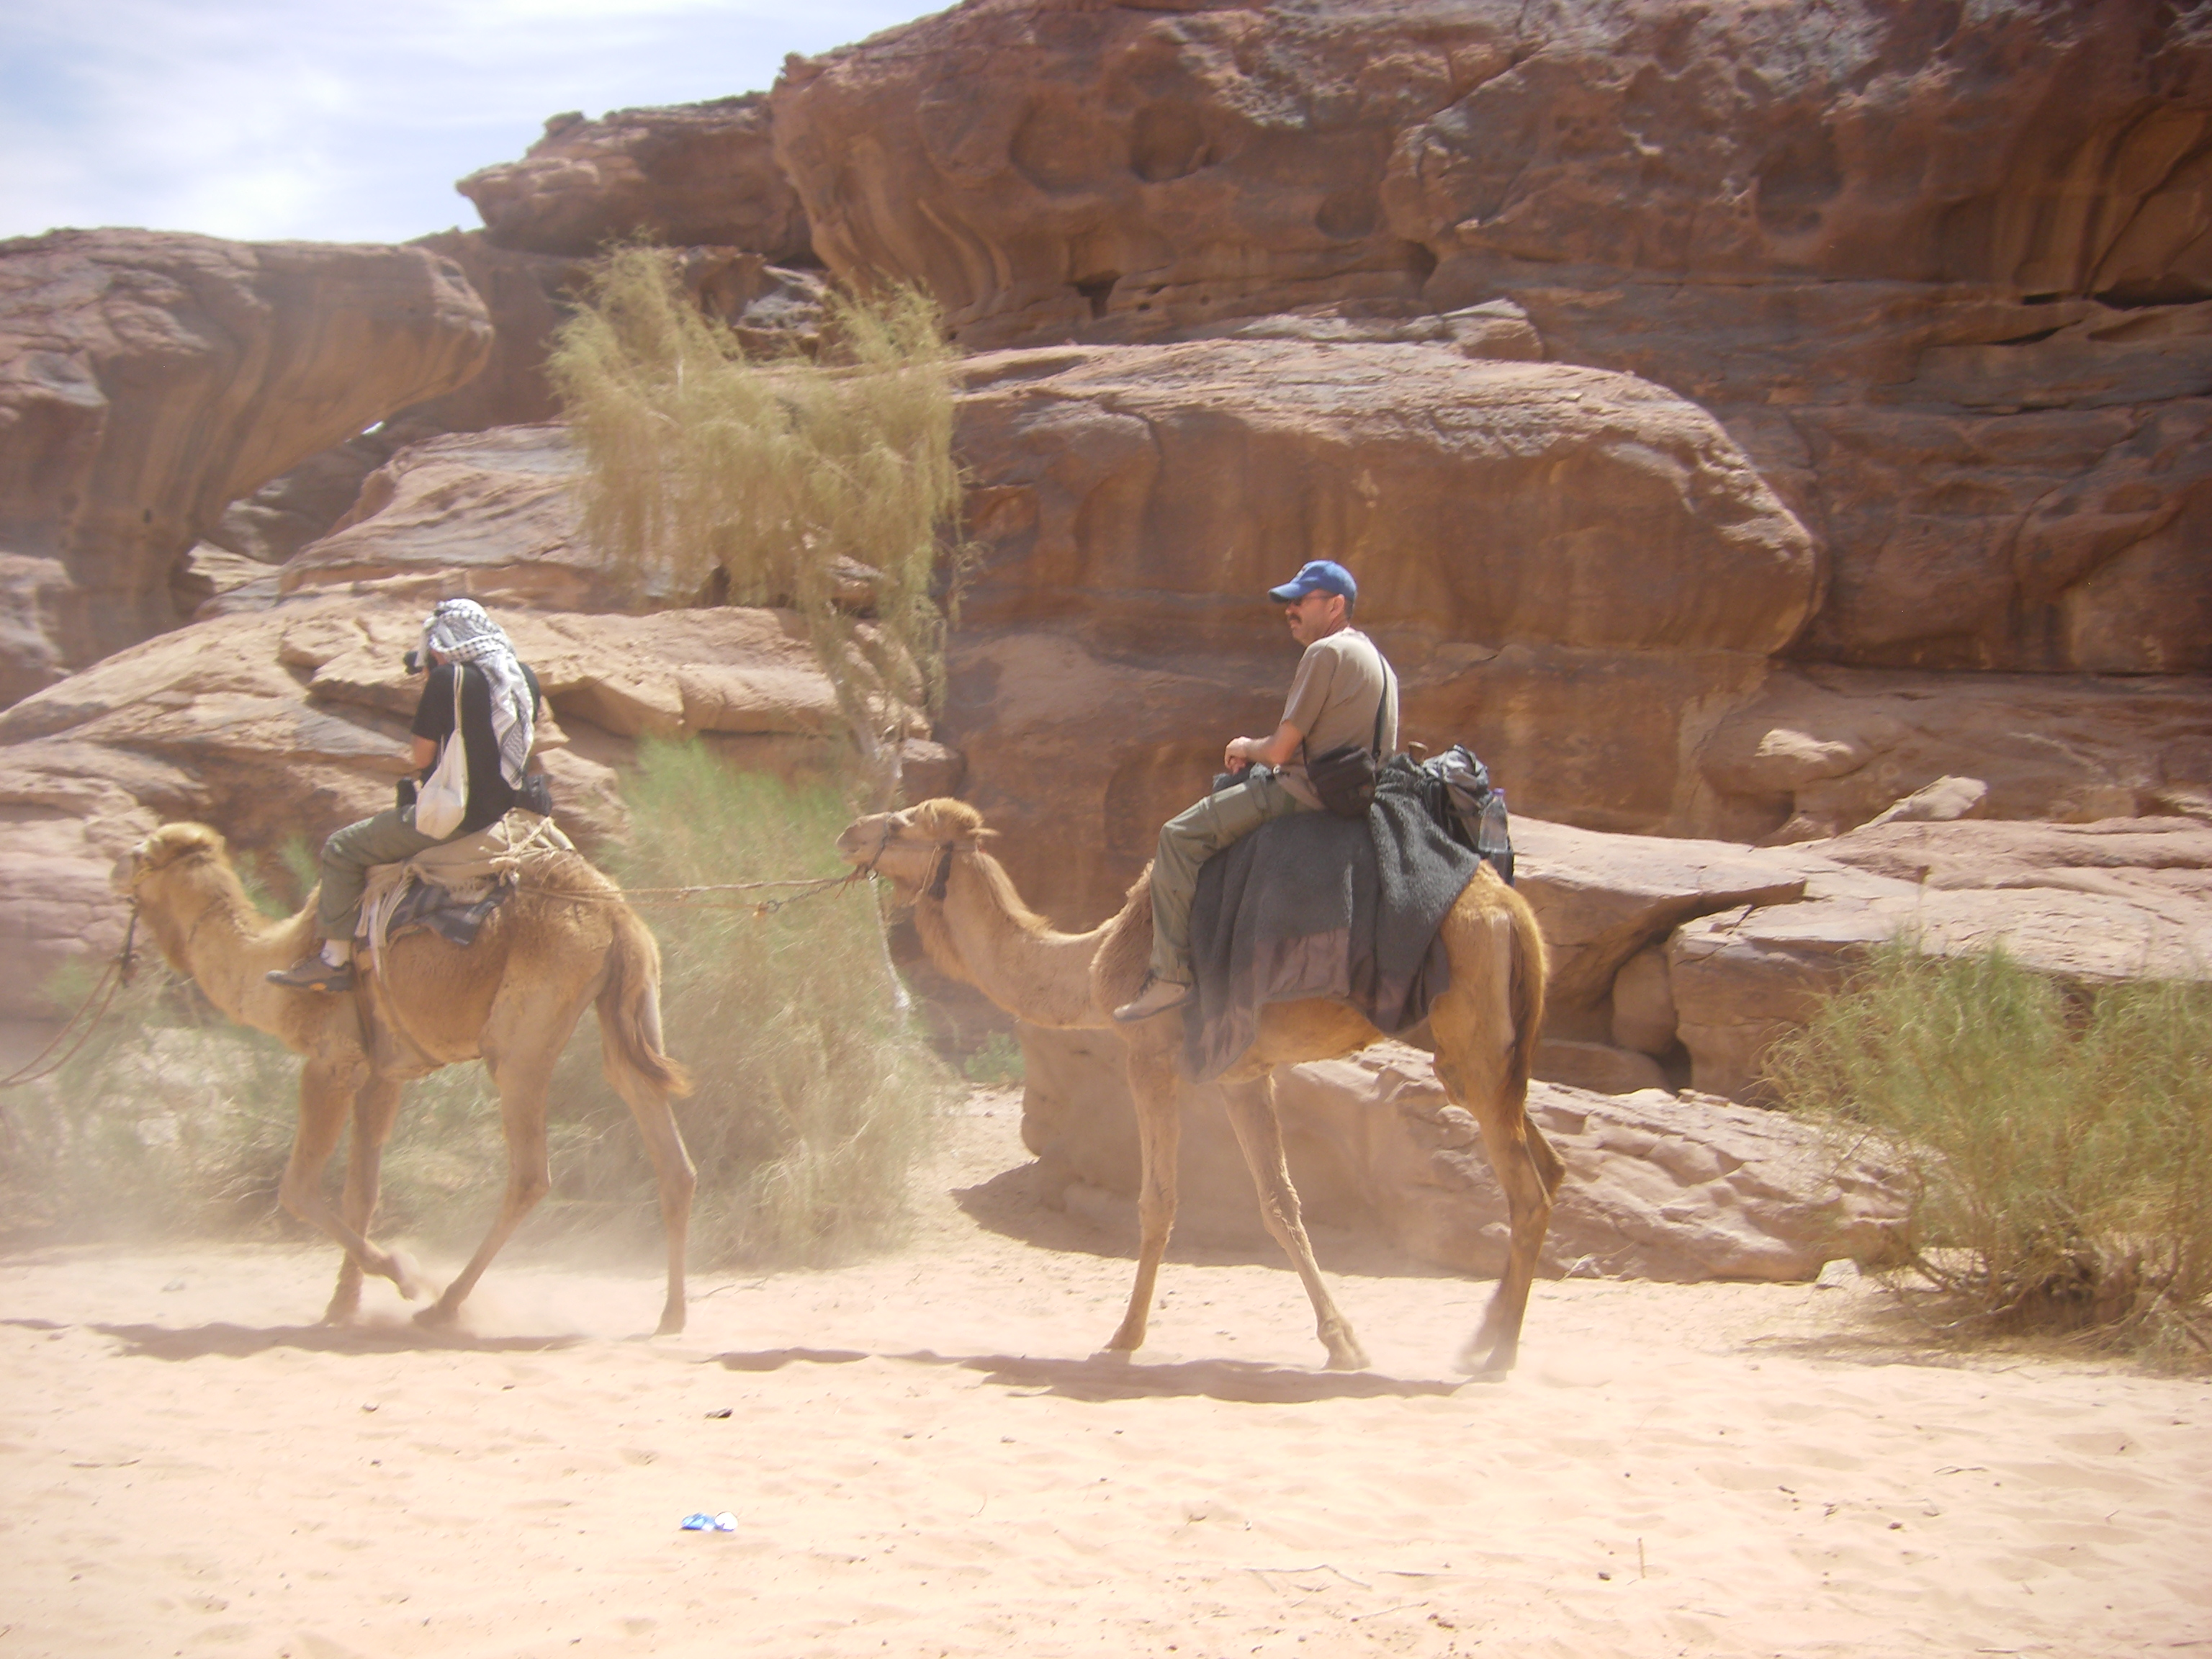 4 mei 2008 Wadi Rum – Aqaba